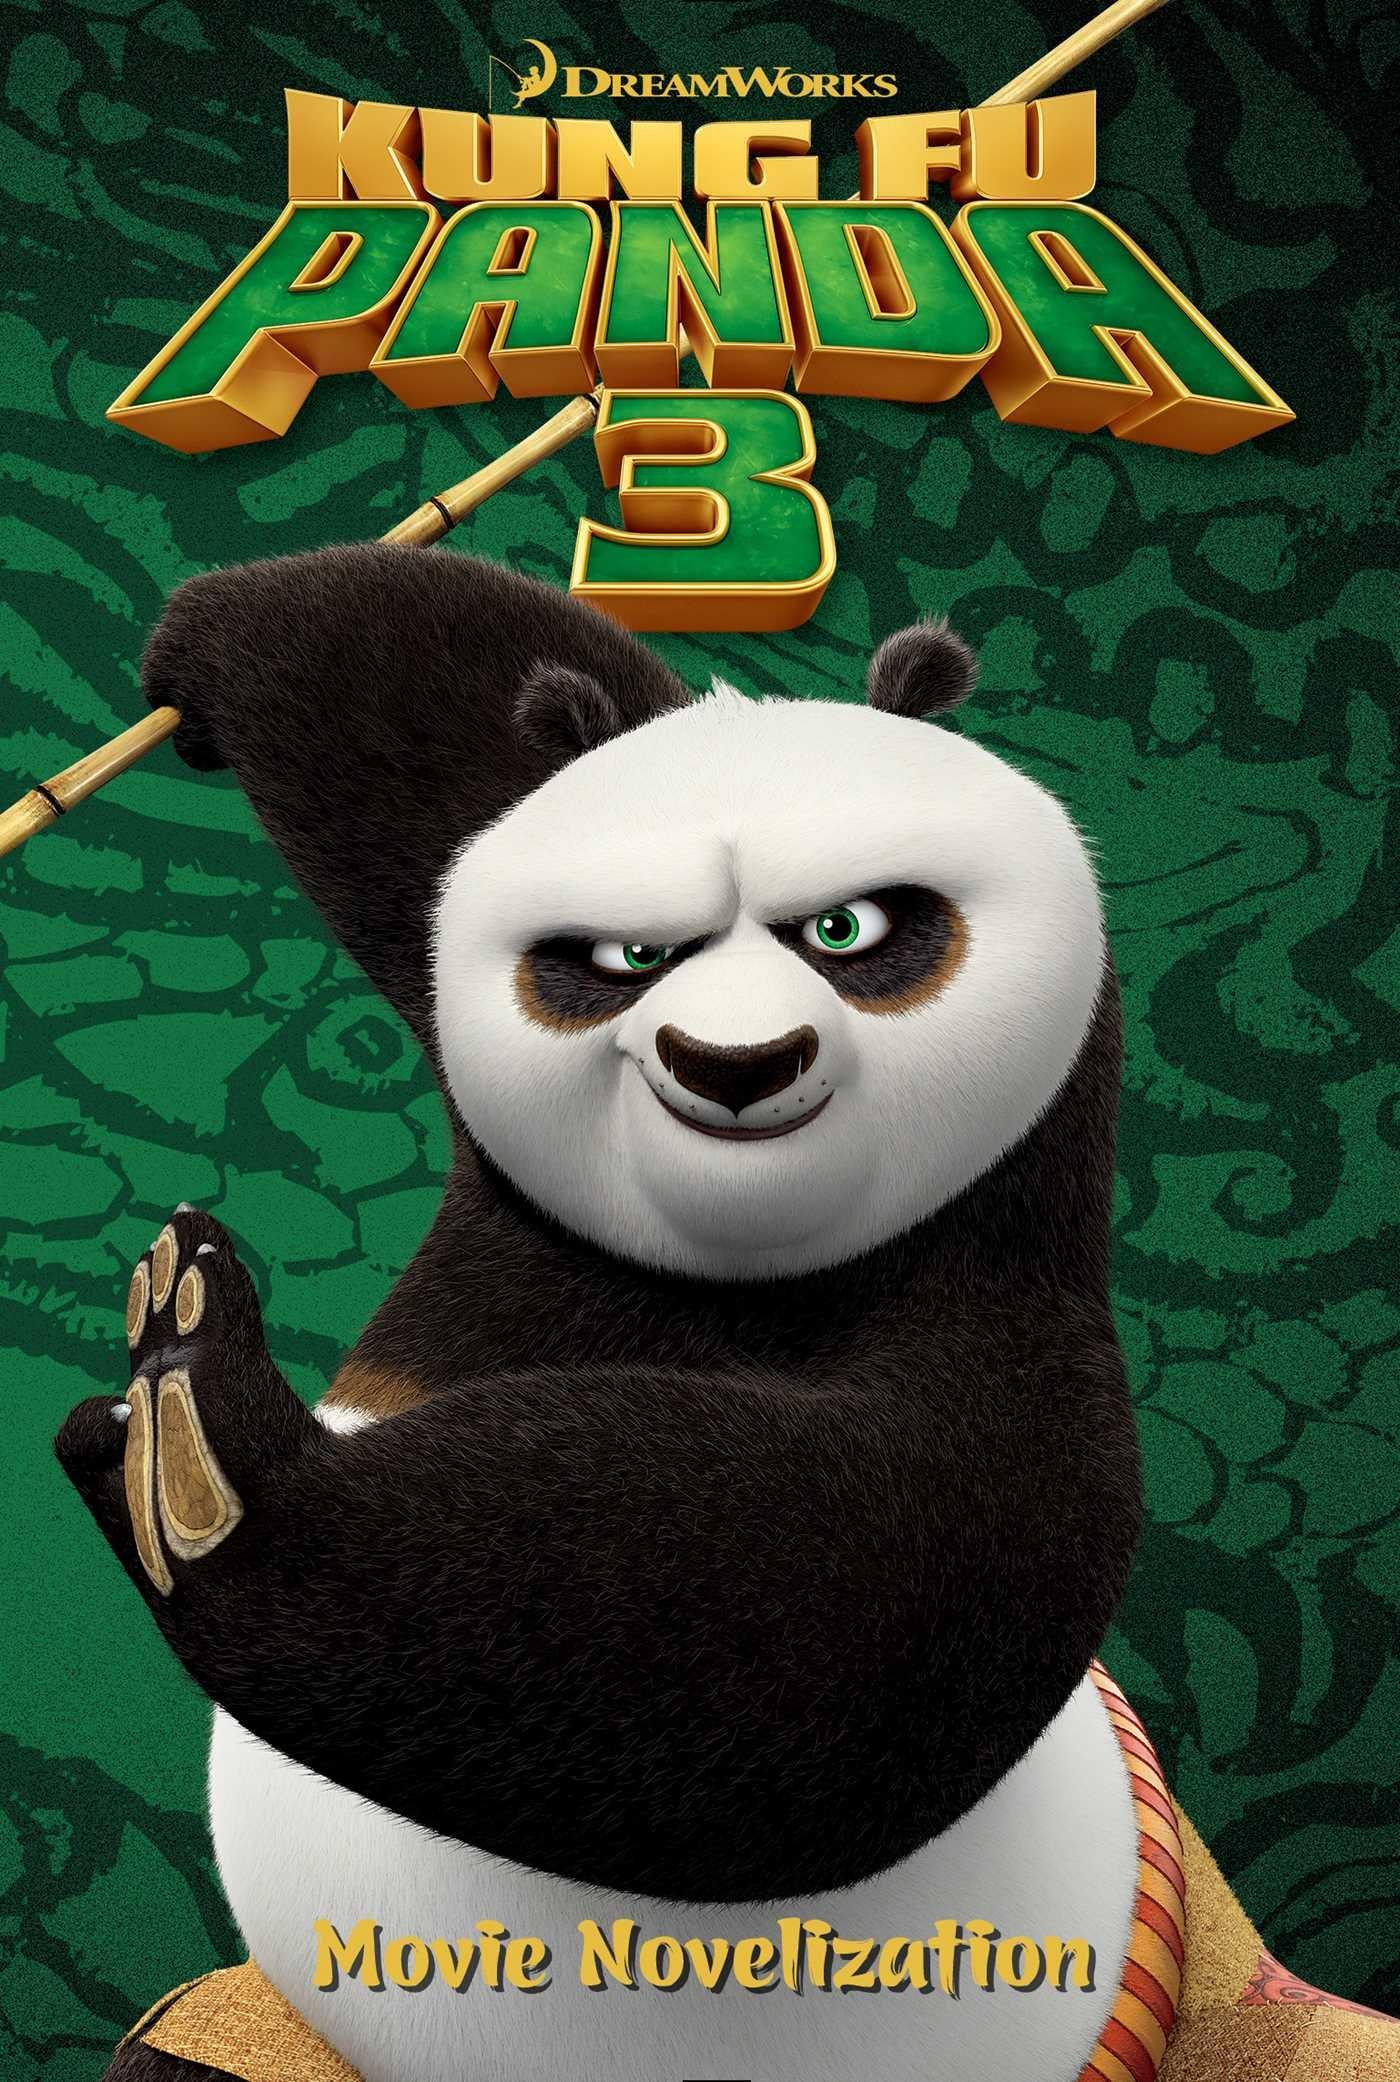 Kung fu panda 3 wiki kungfupanda fandom powered by wikia - Singe kung fu panda ...